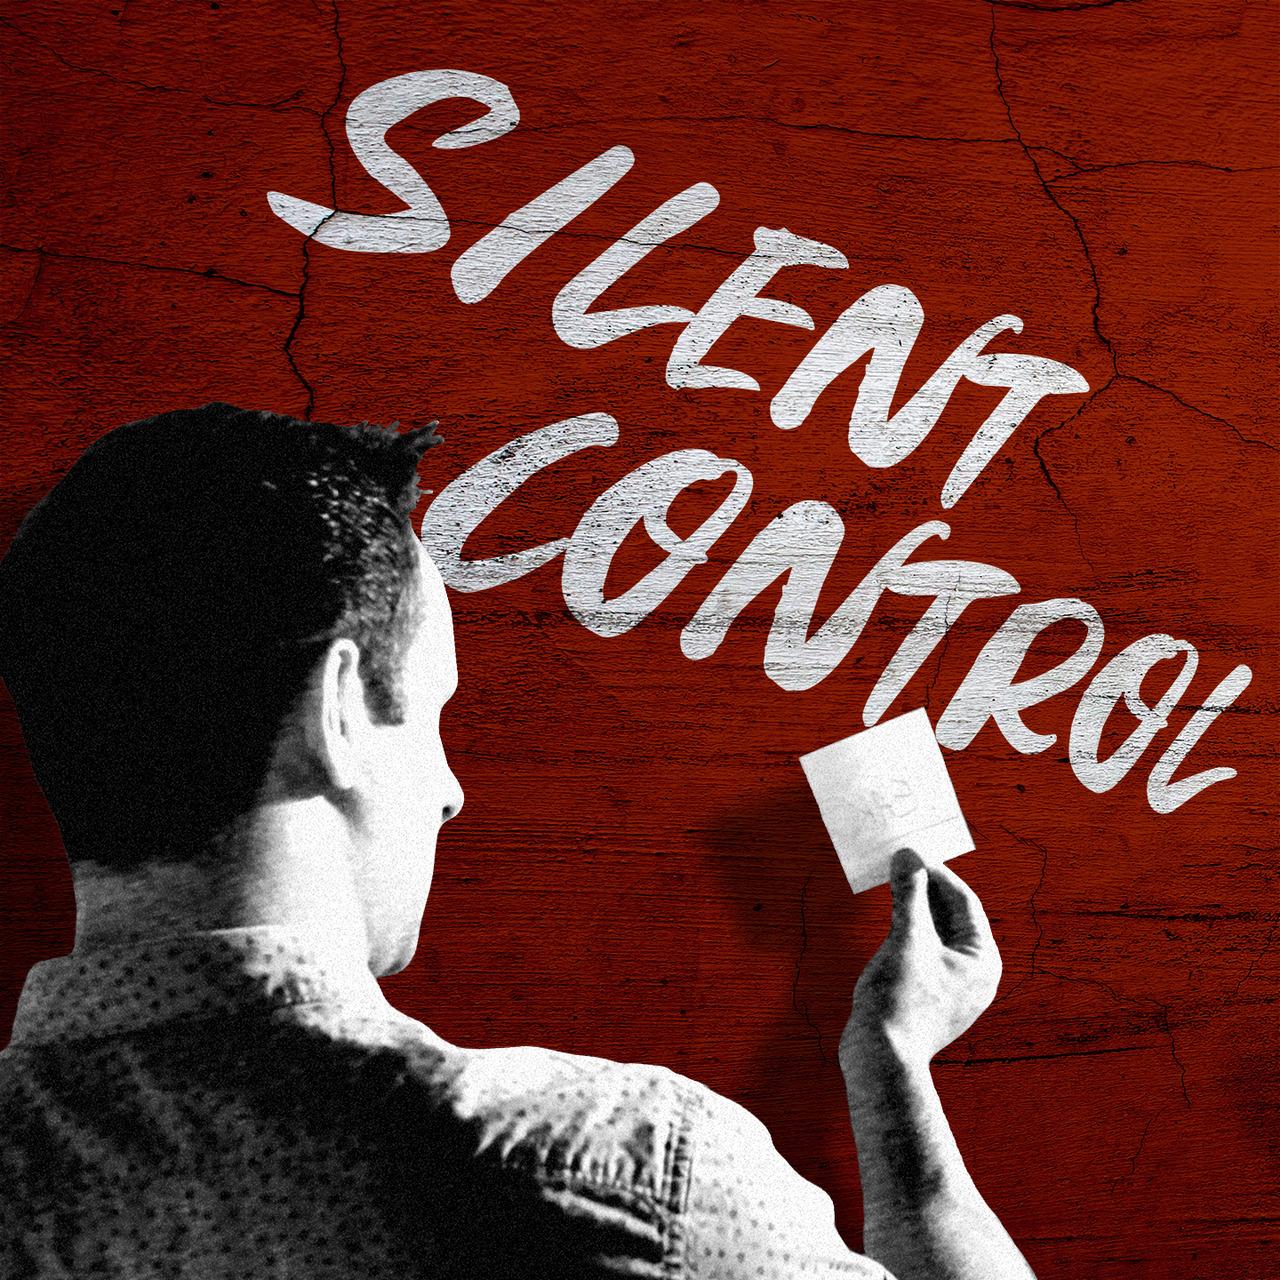 Silent Control by Rick Lax & Alan Wong